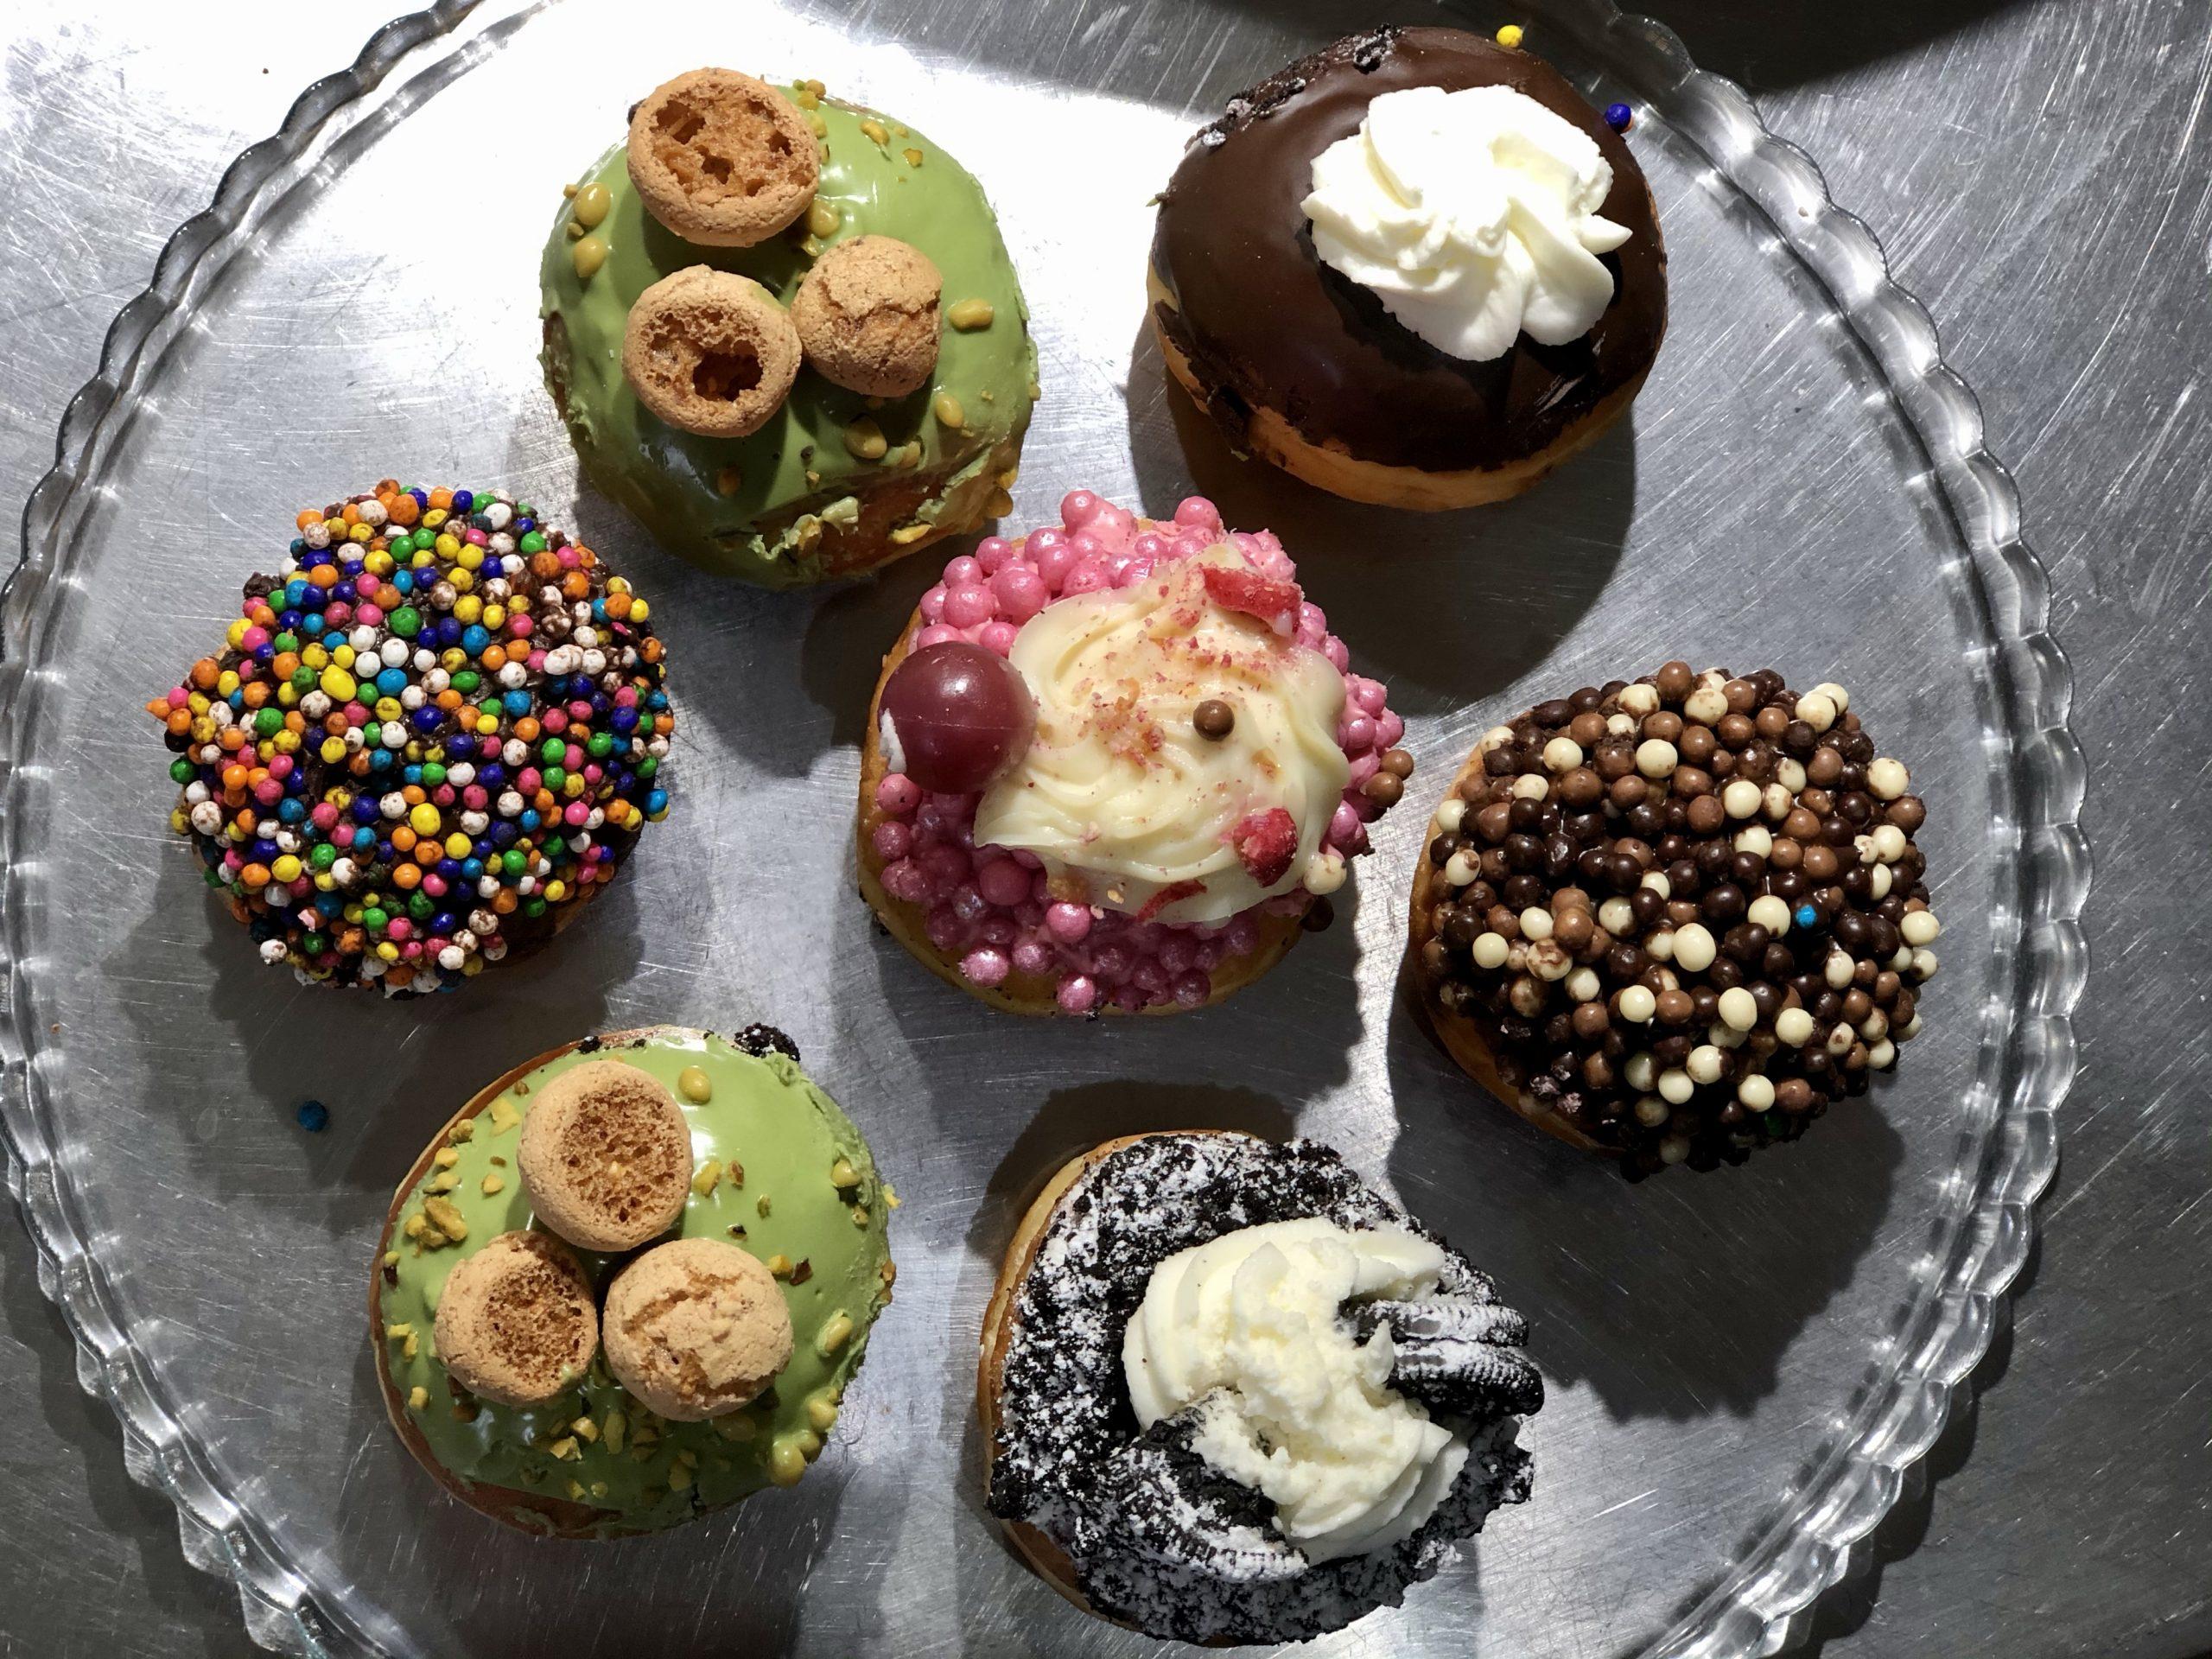 Sufganiyot from Roladin, an Israeli bakery chain